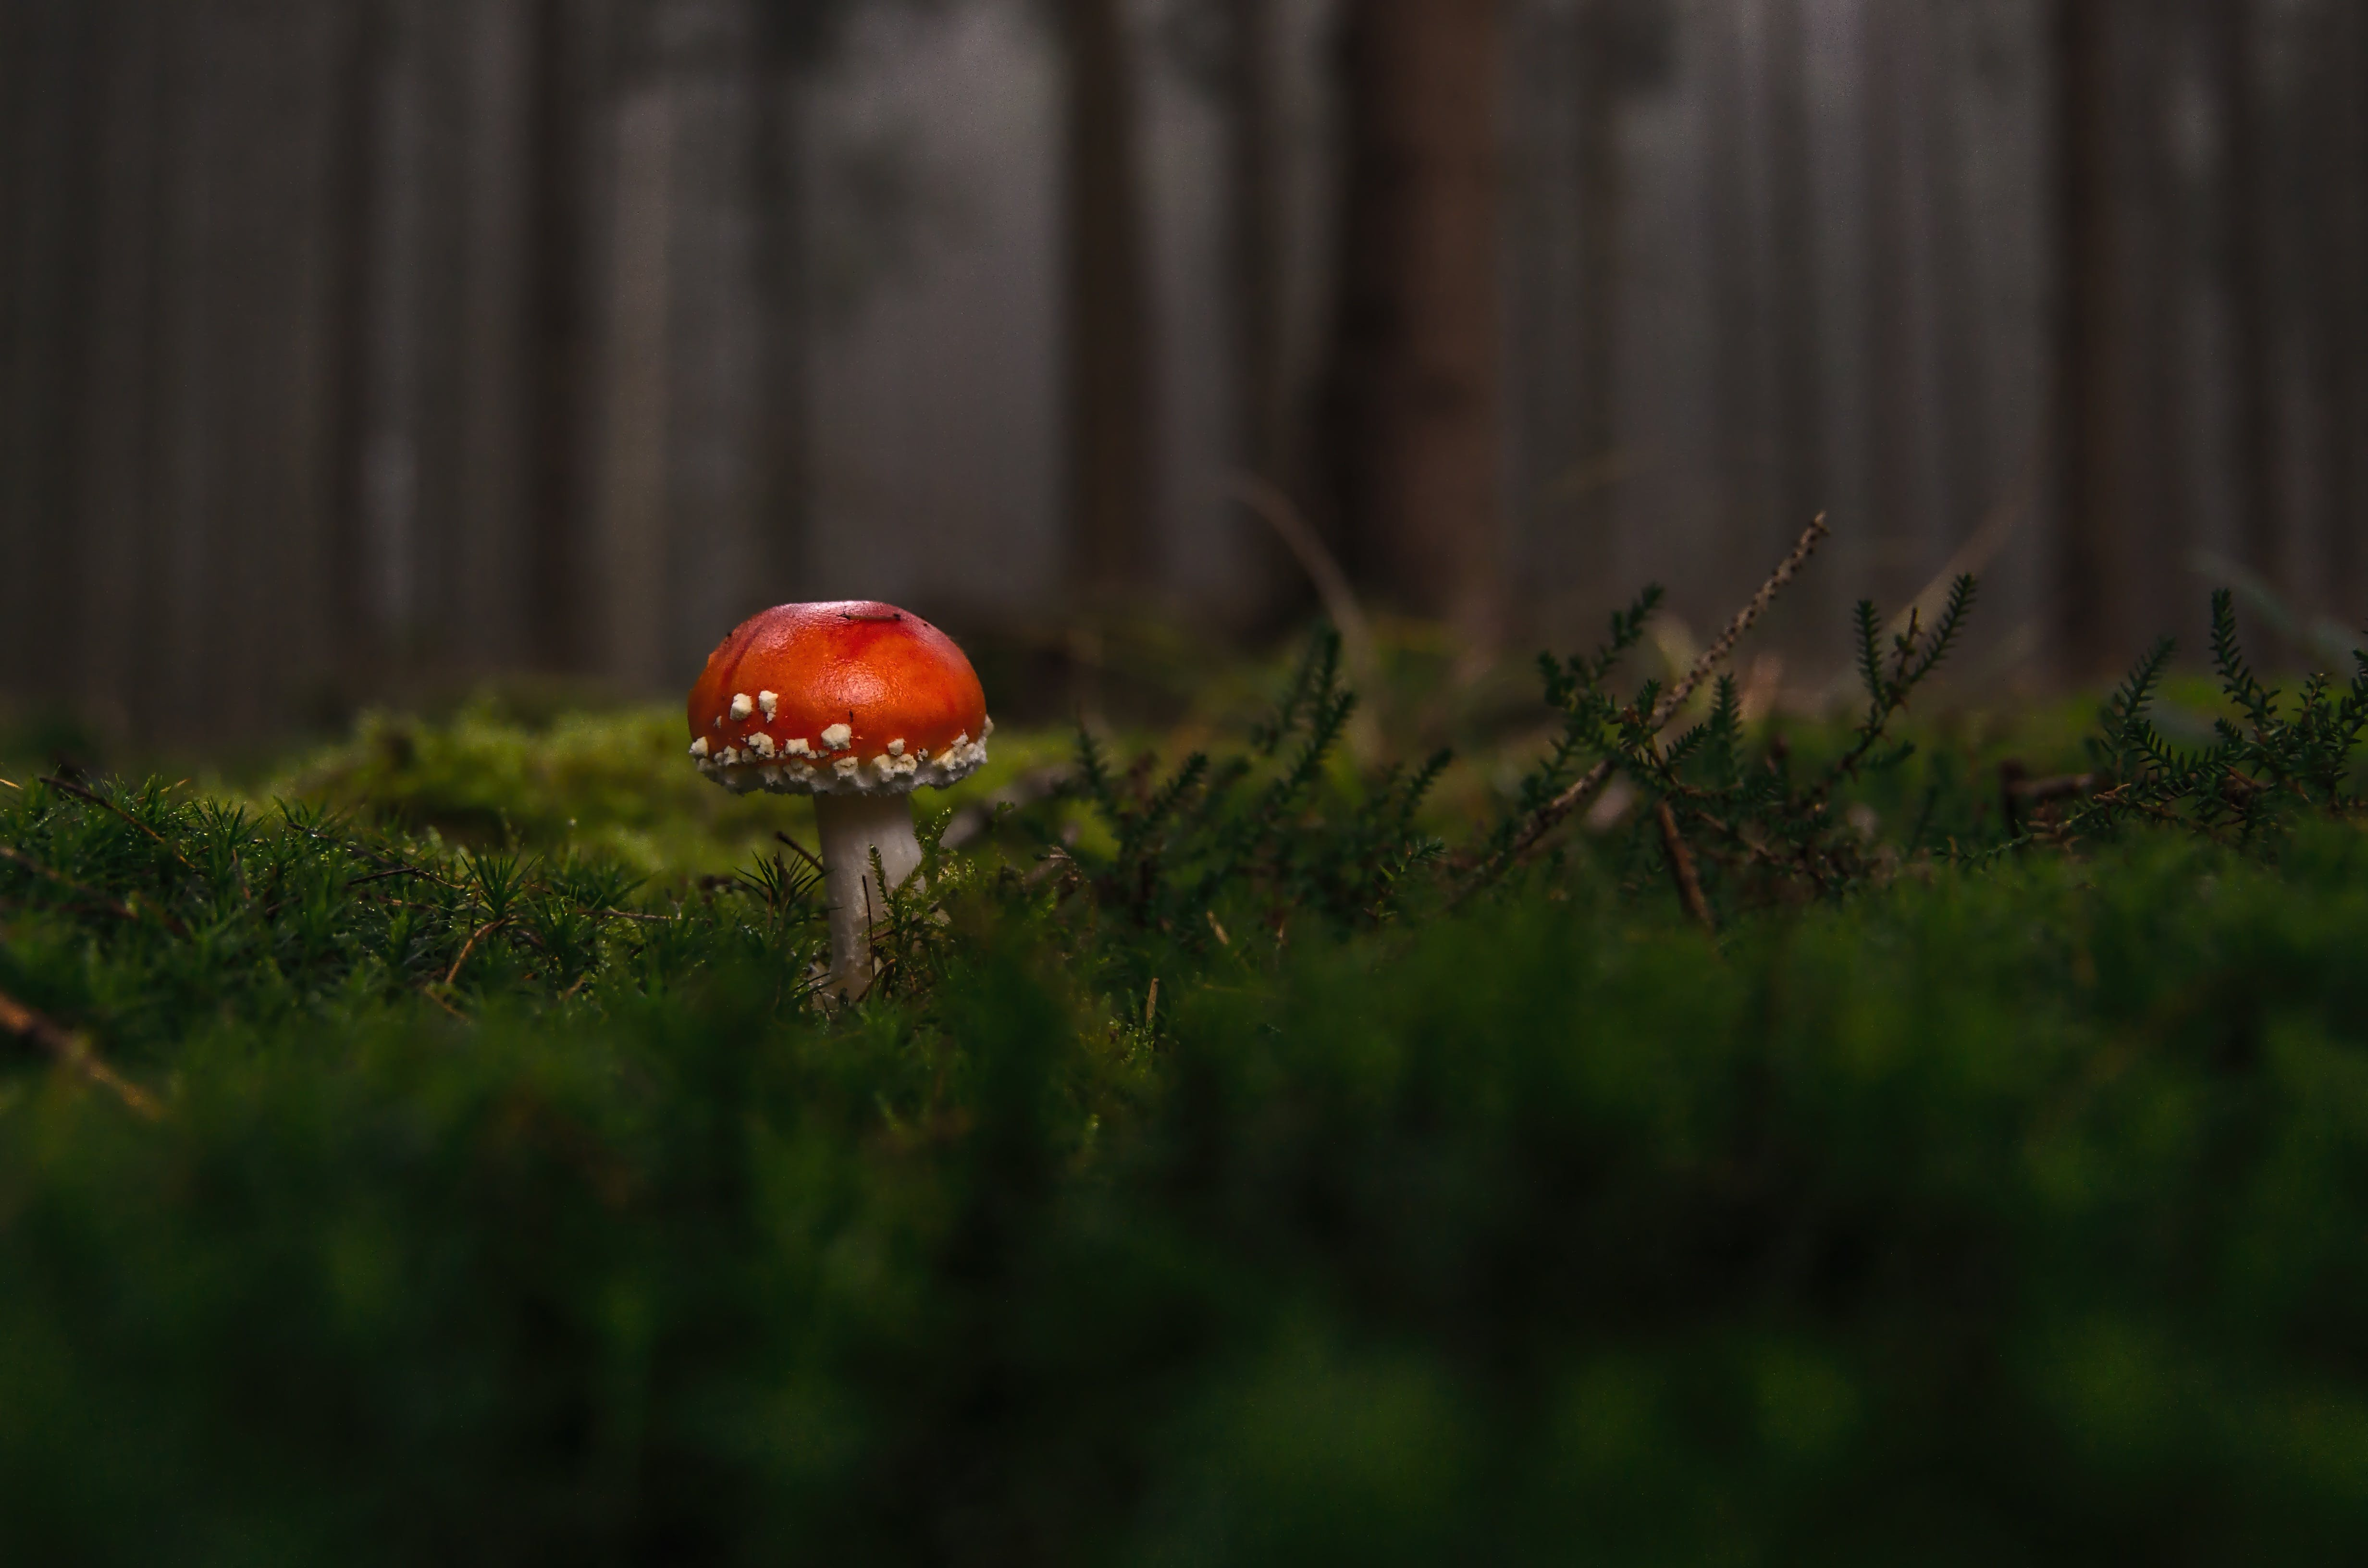 Red and White Mushroom